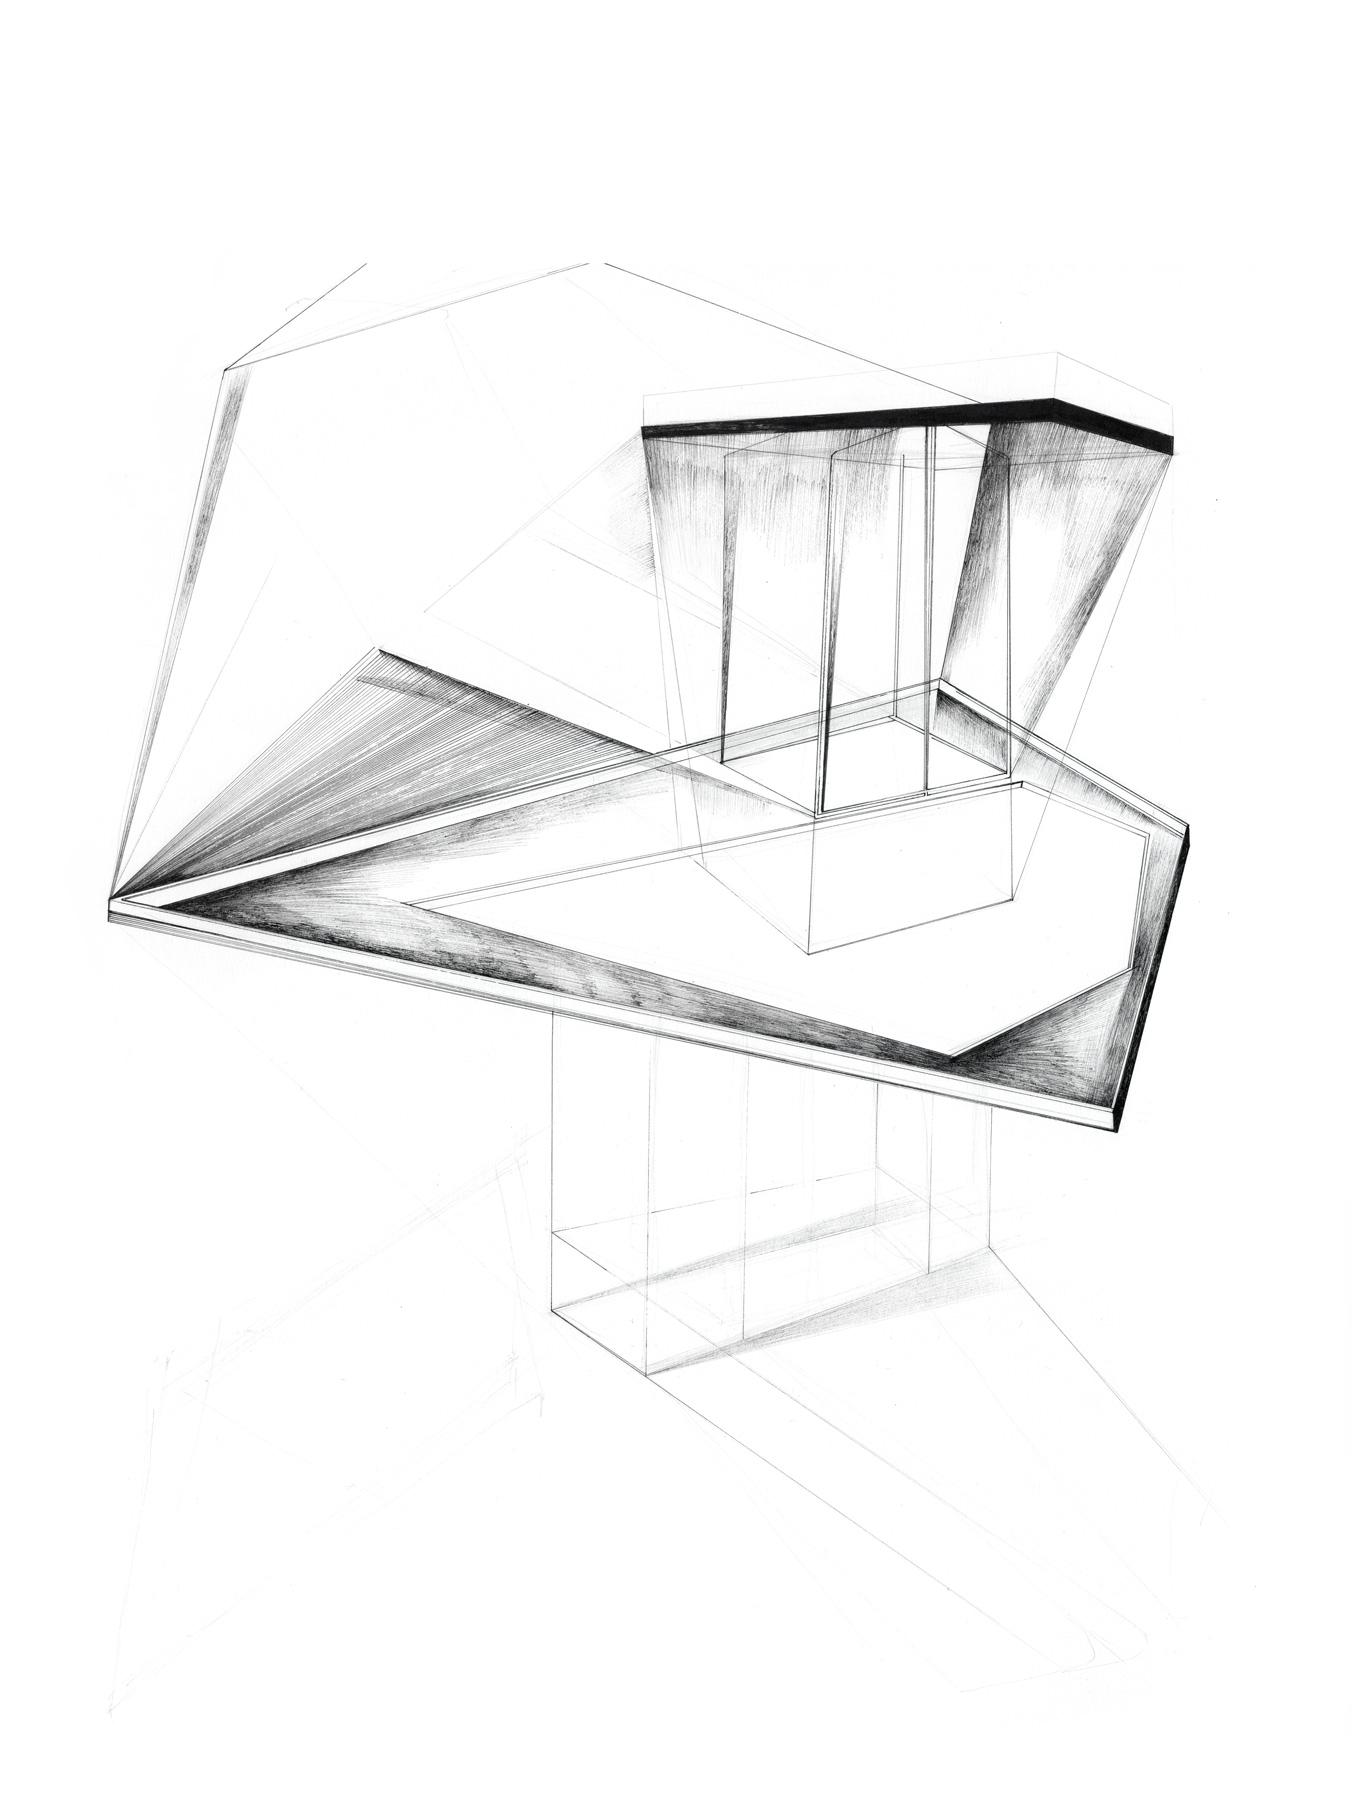 Nina Annabelle Märkl | Shifting perceptions muc_10 | ink on paper | 35,5 x 27,5 cm| 2016